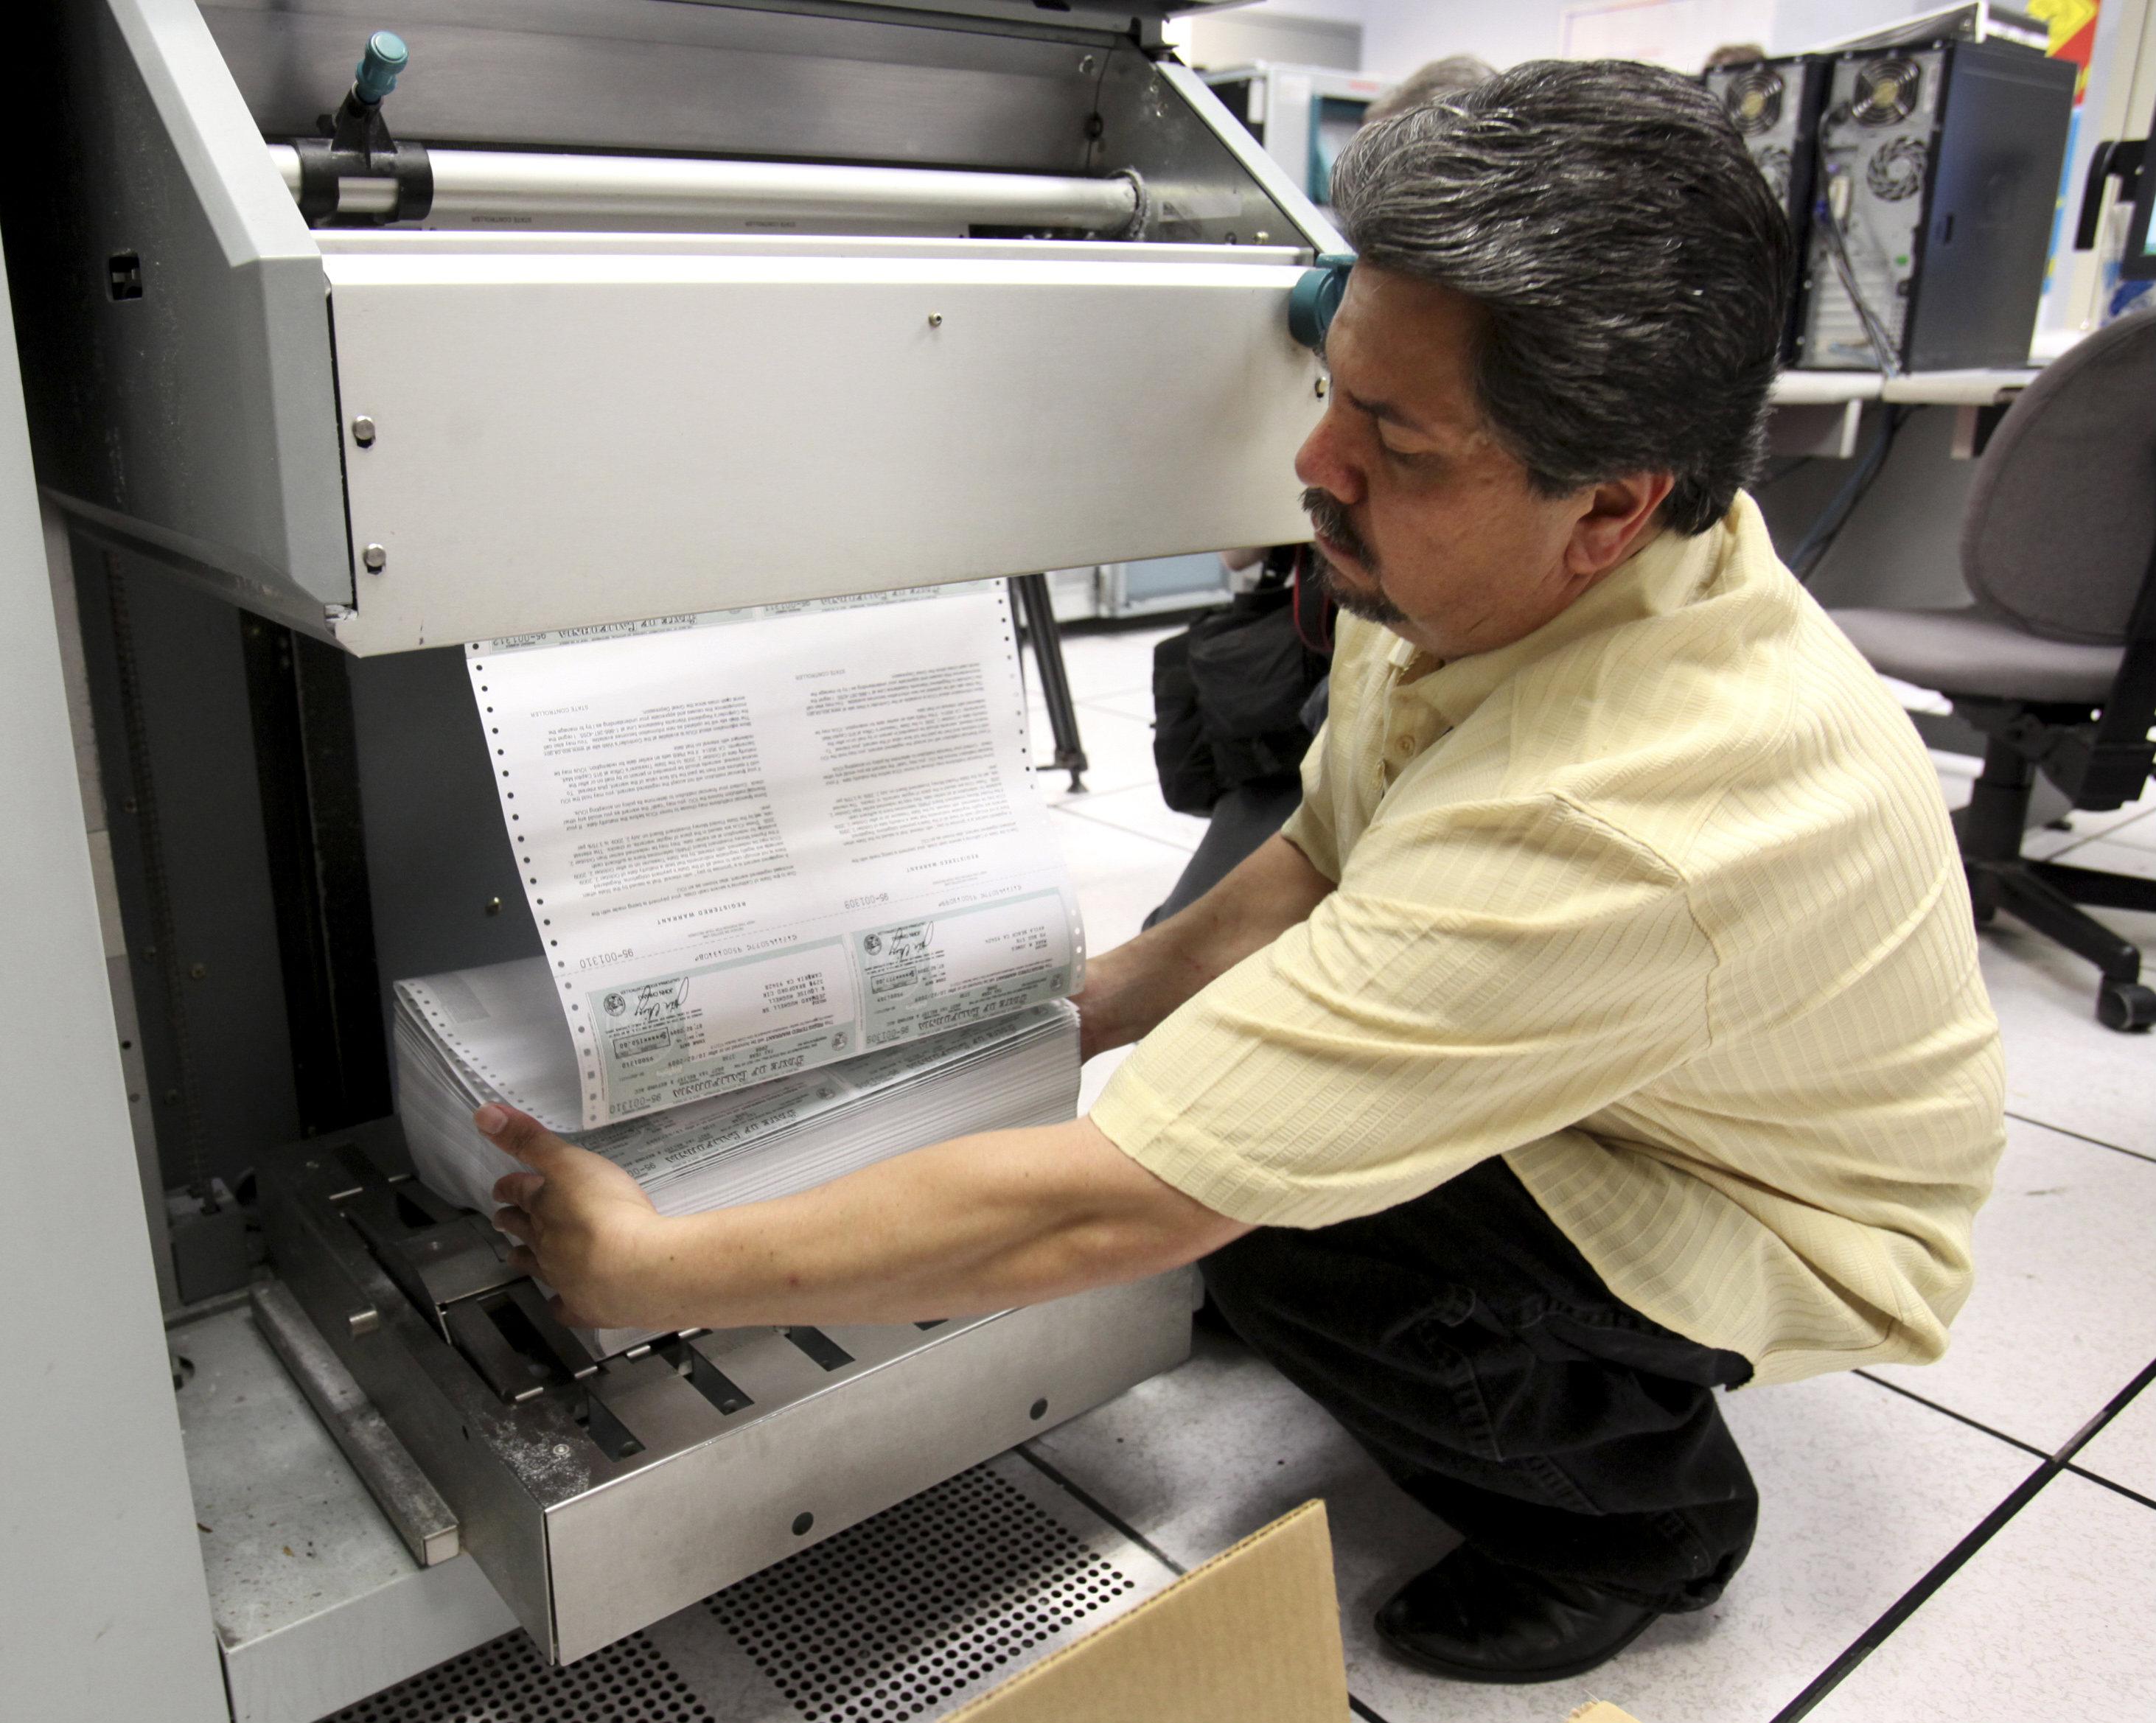 California prints scrip in 2009